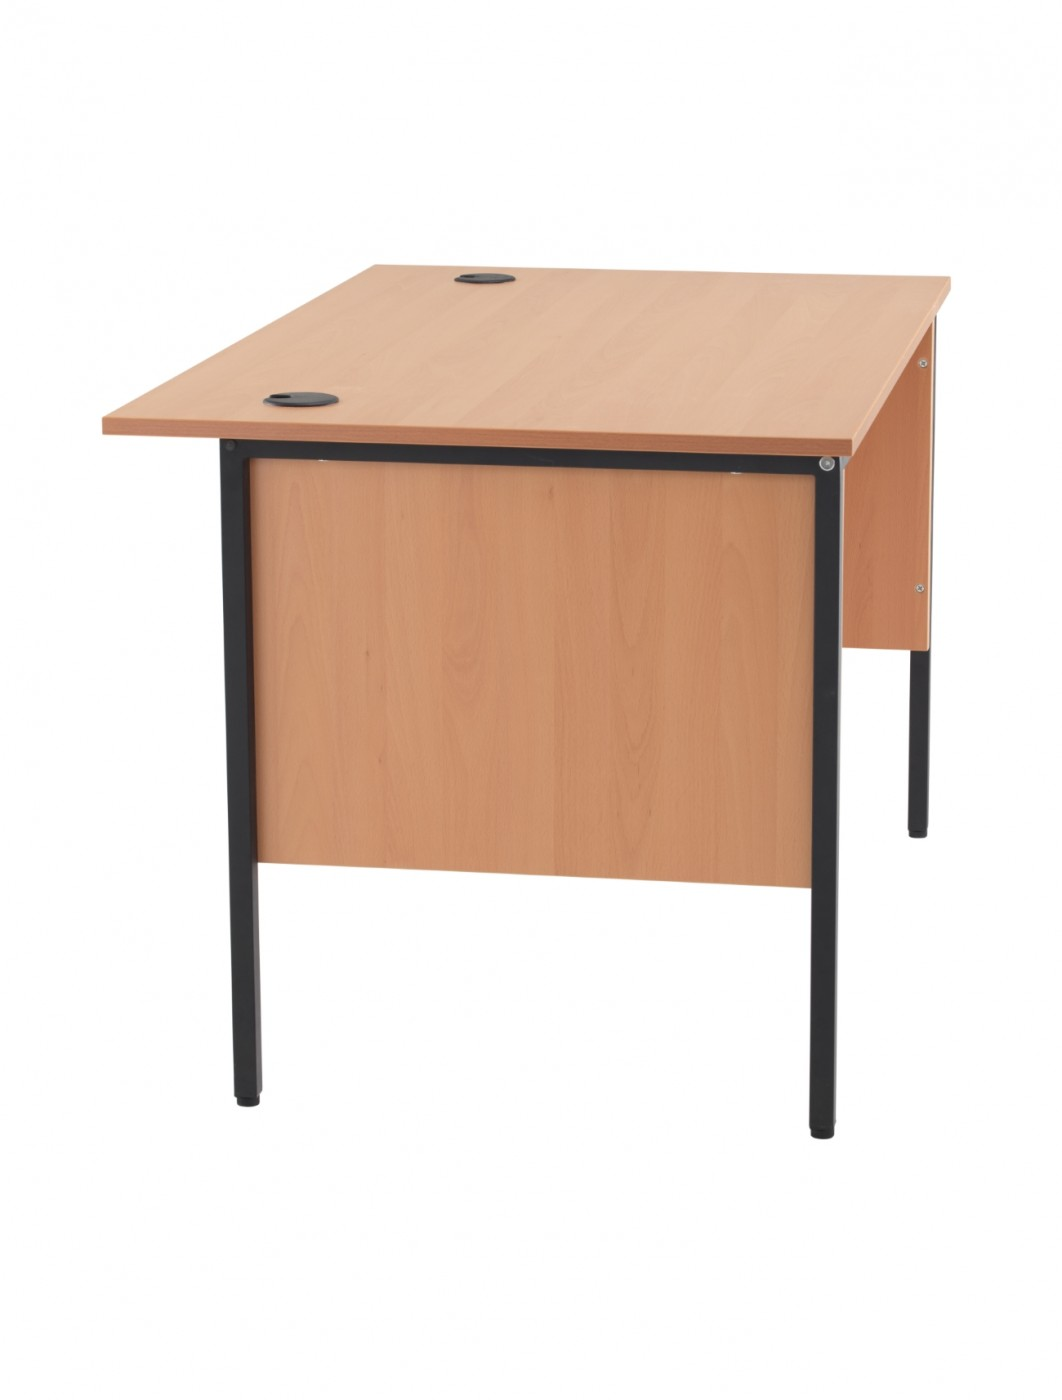 Home Office Furniture Uk Desk Set 18: Beech Office Desk 1228x746mm TC Start 18 Desk